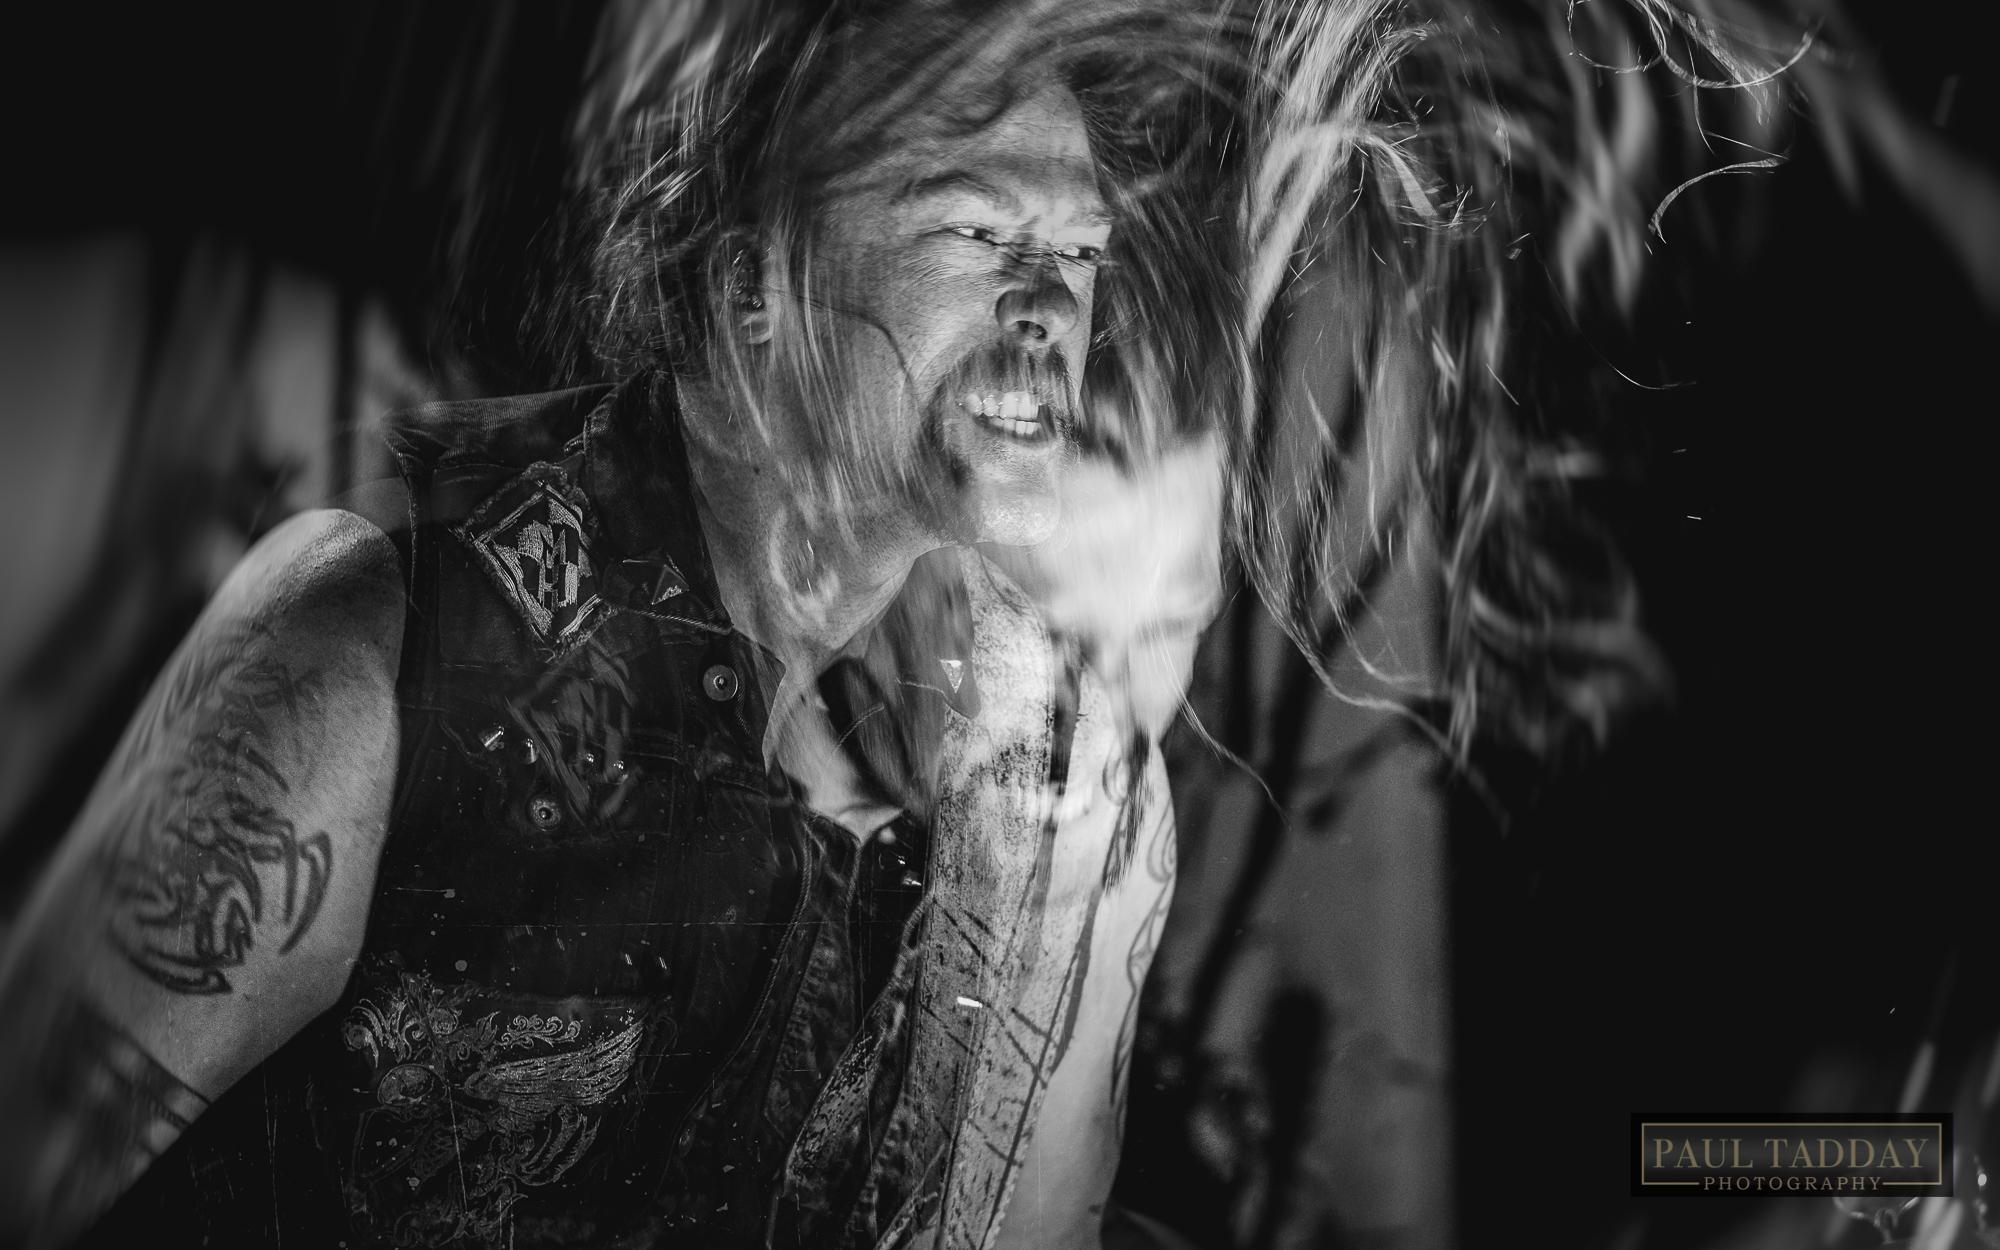 MachineHead-2018-PaulTaddayPhotography-043.jpg